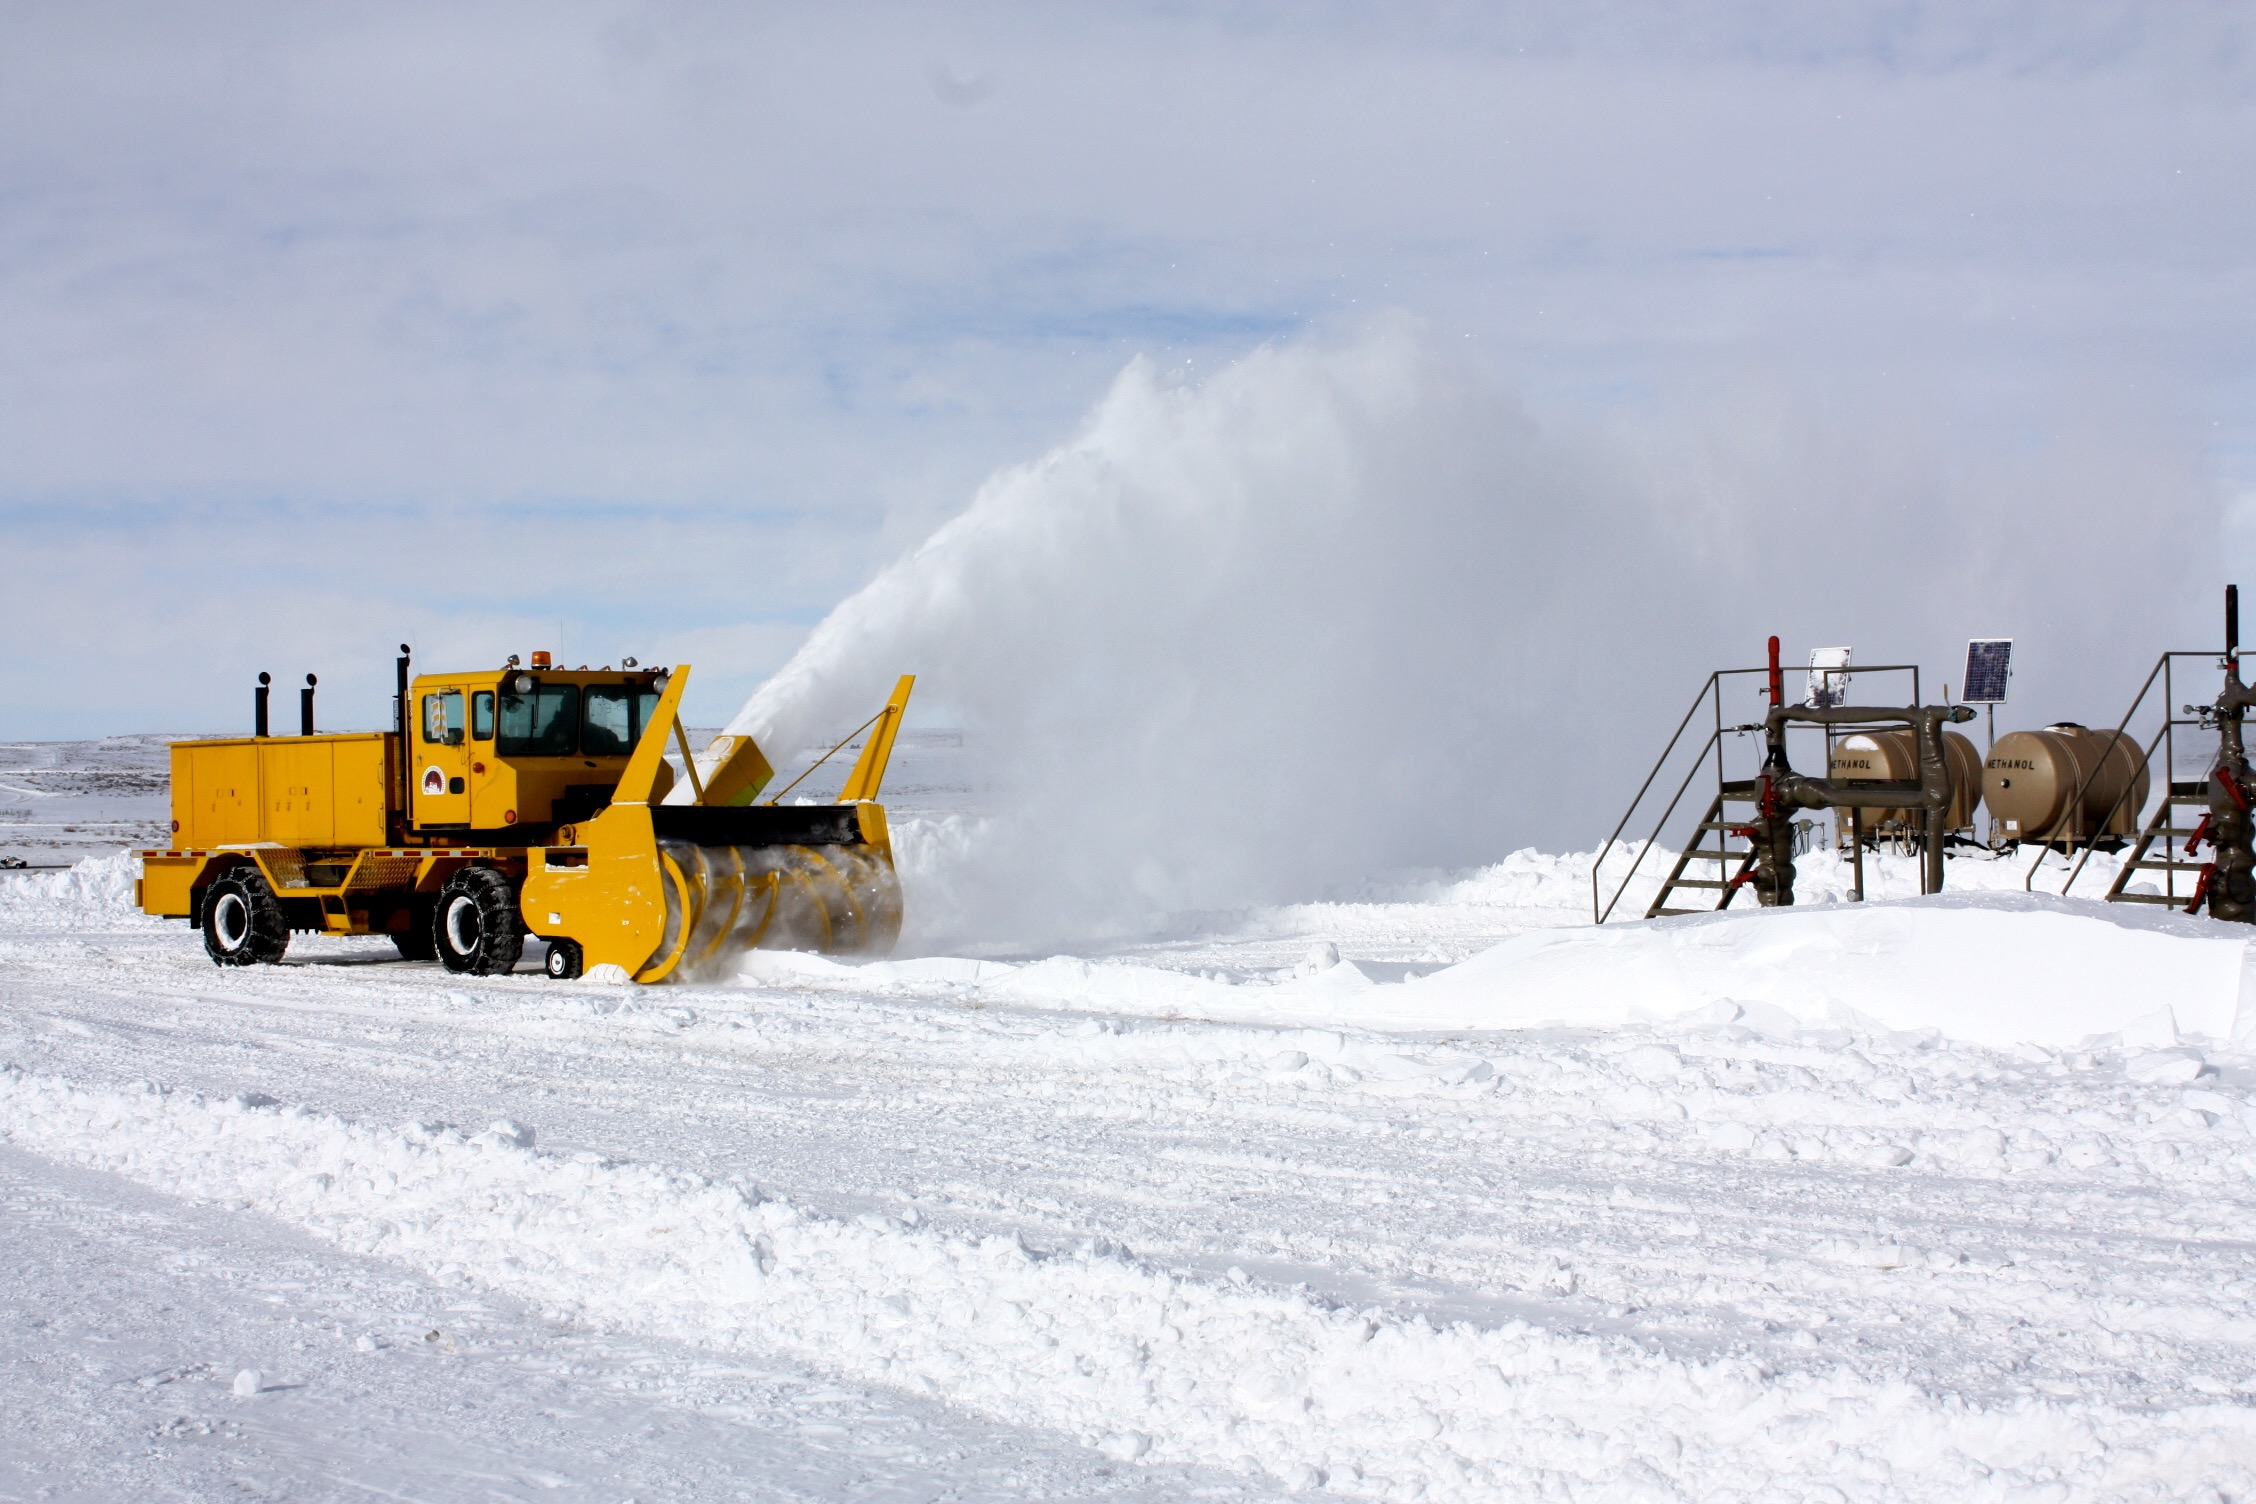 Anadarko Petroleum - Snow Removal